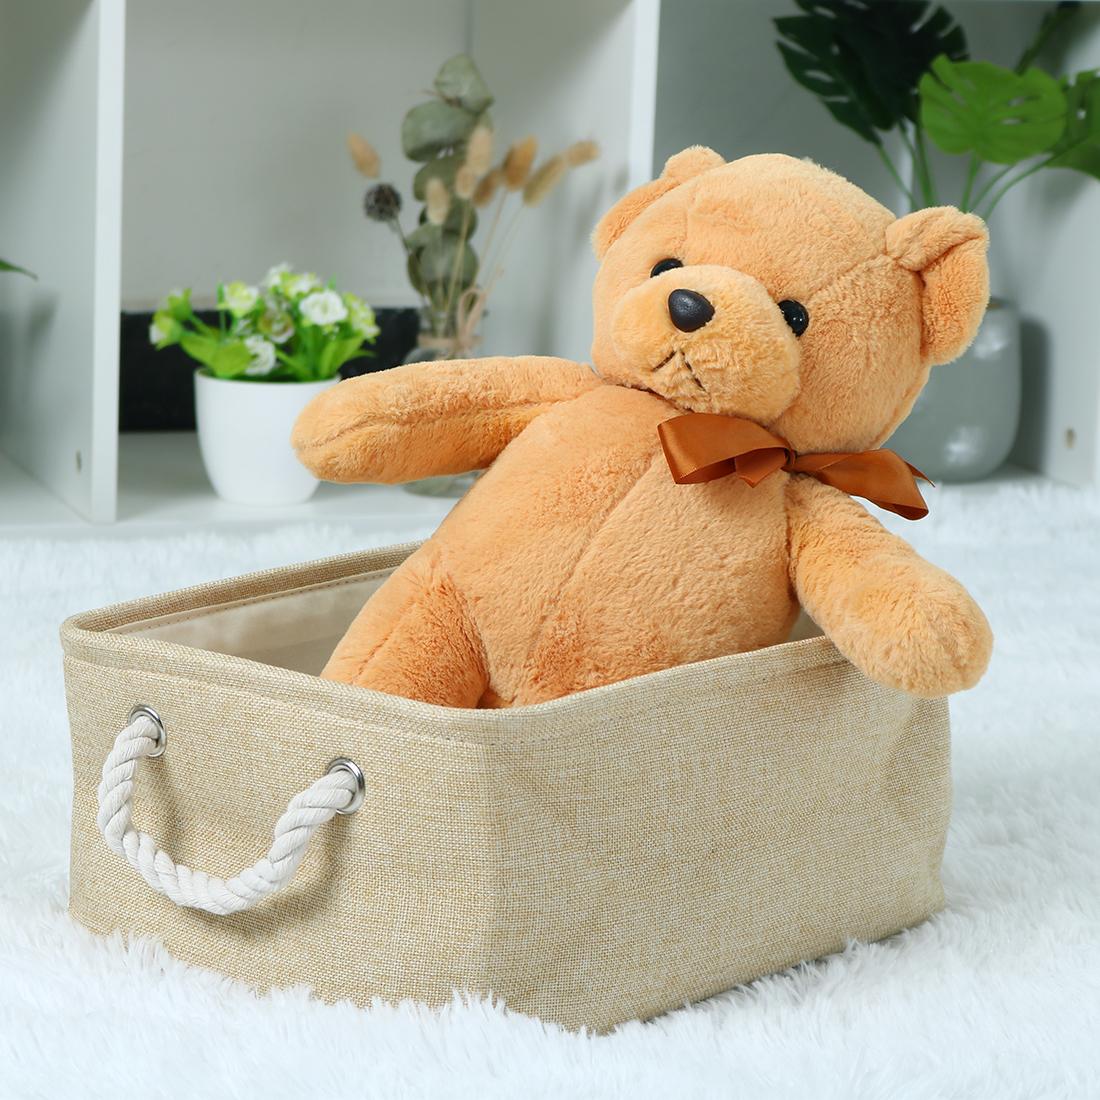 Home Fabric Storage Basket Bin w Dual Rope Handles for Laundry Khaki, Small - image 2 de 8